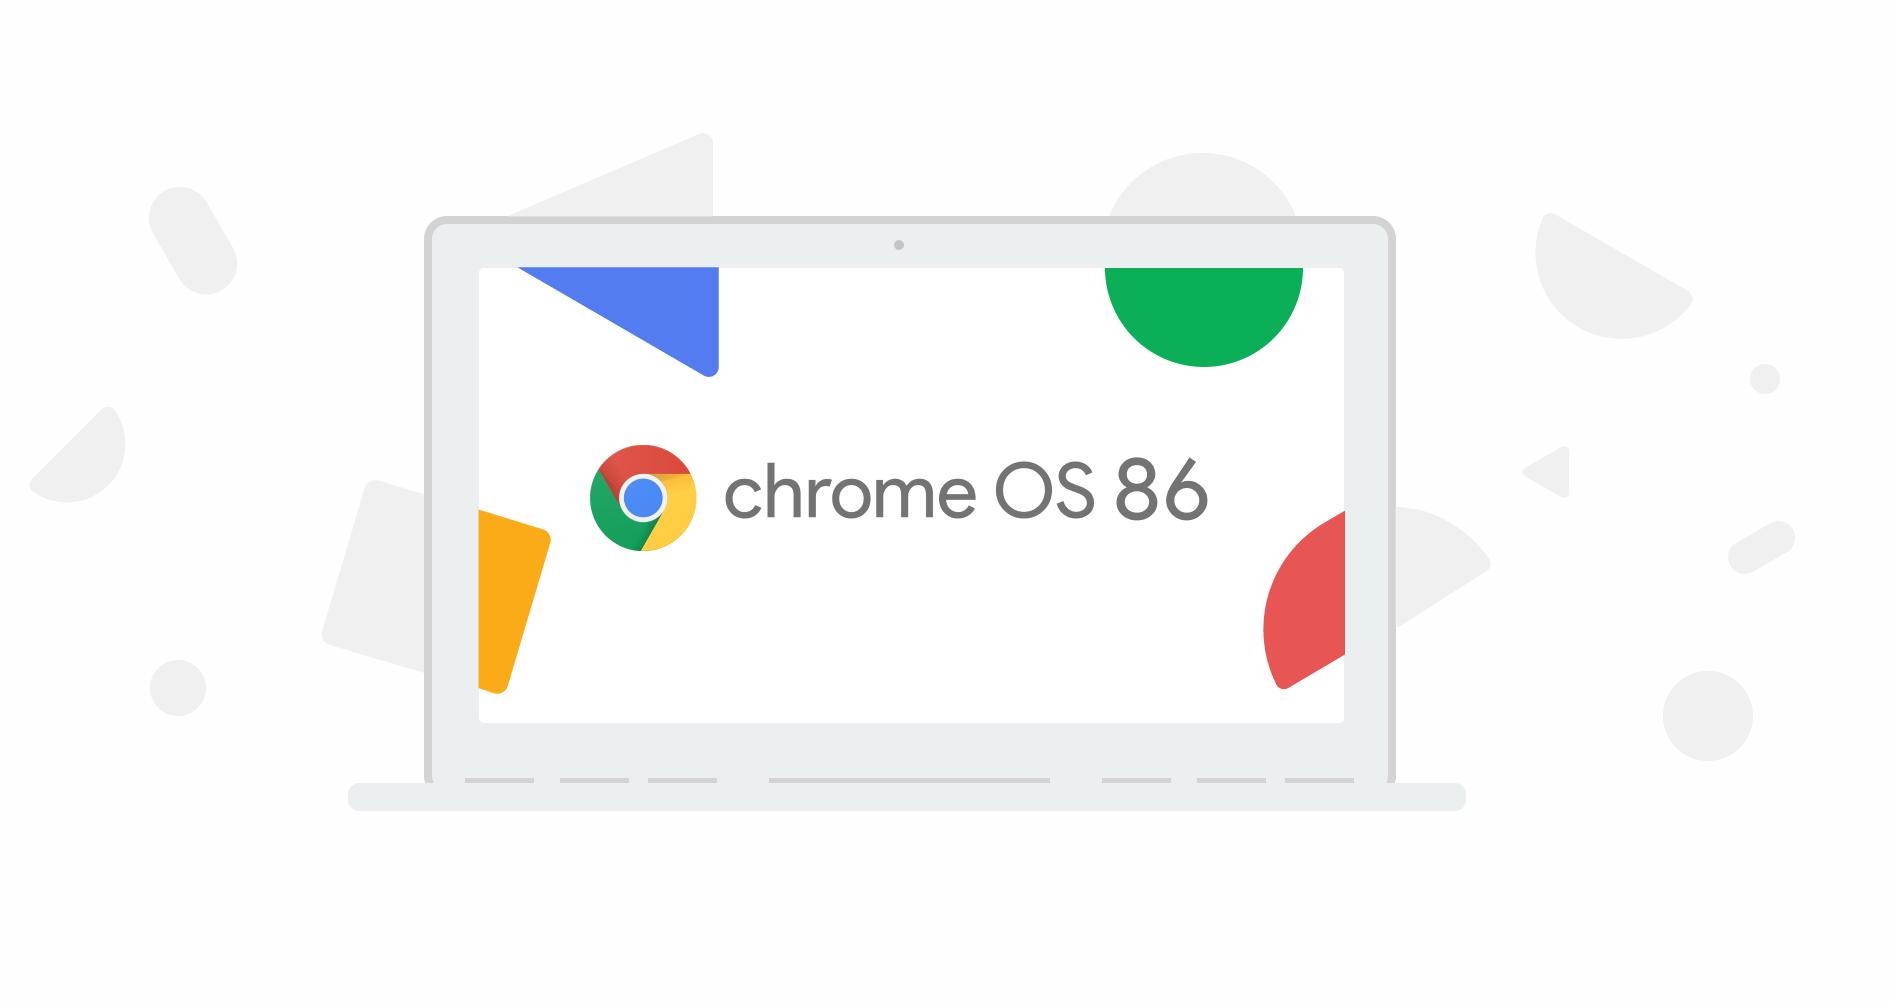 ChromeOS 86